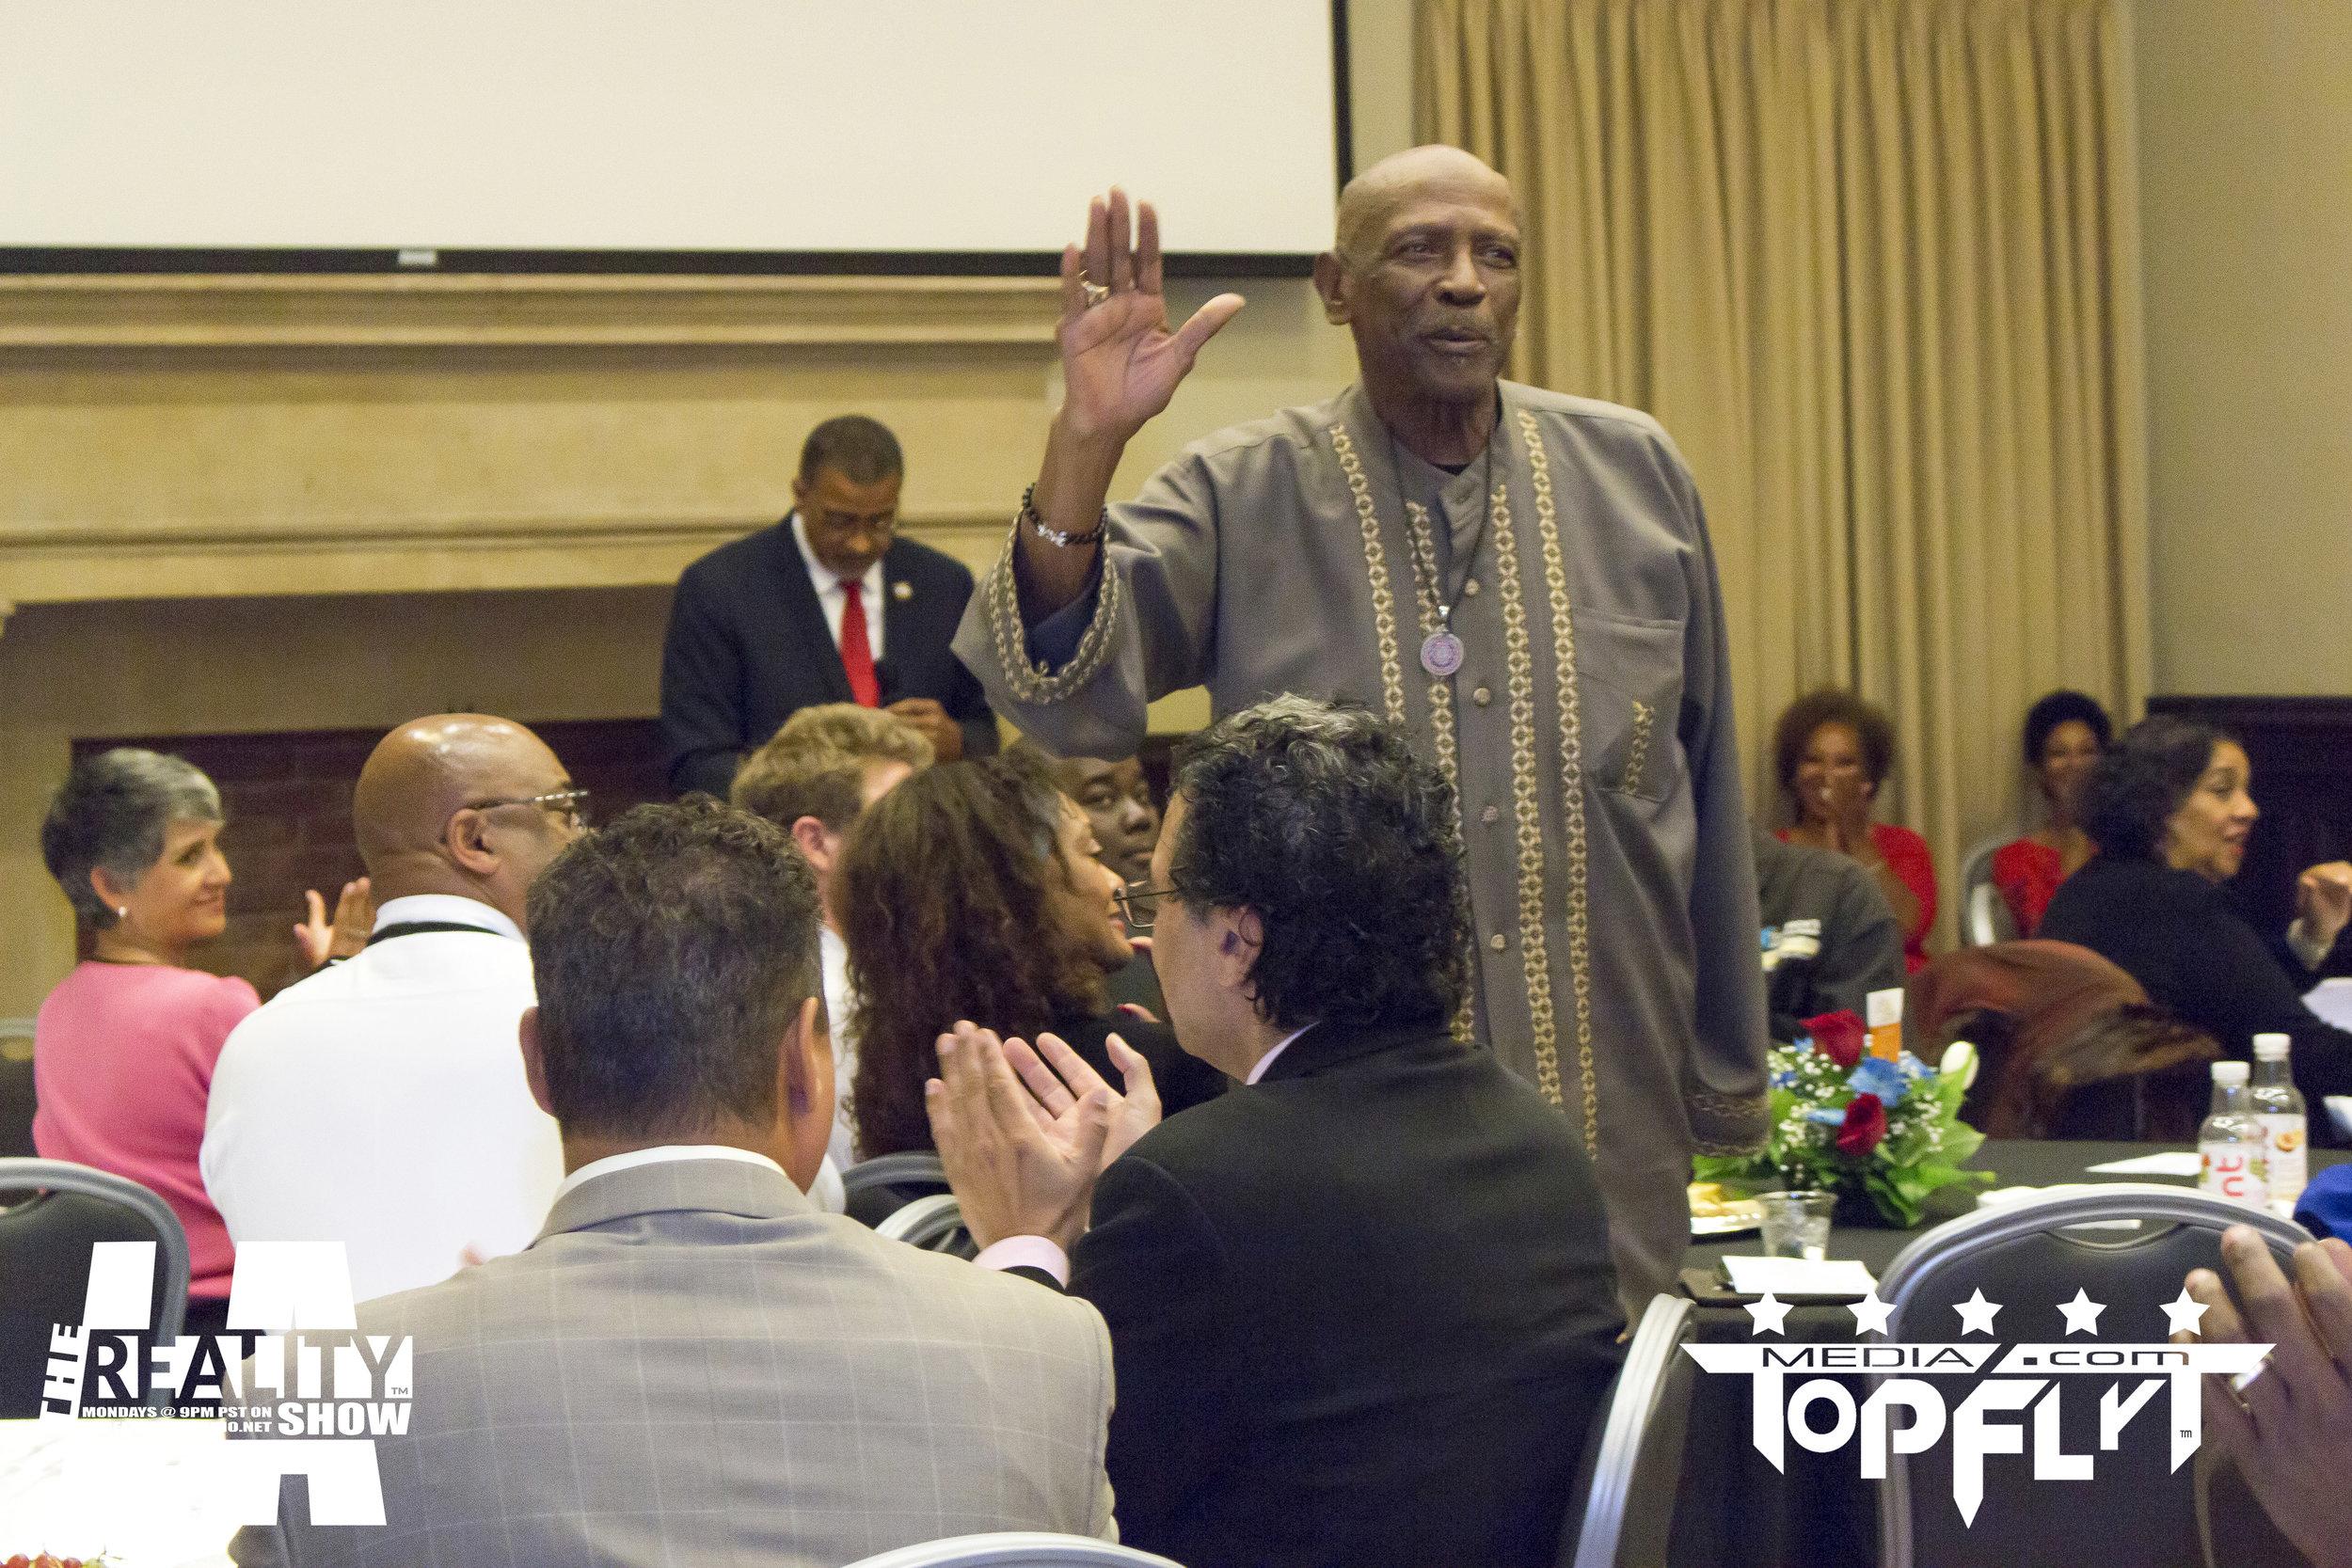 The Reality Show LA - Tuskegee Airmen 75th Anniversary VIP Reception_77.jpg